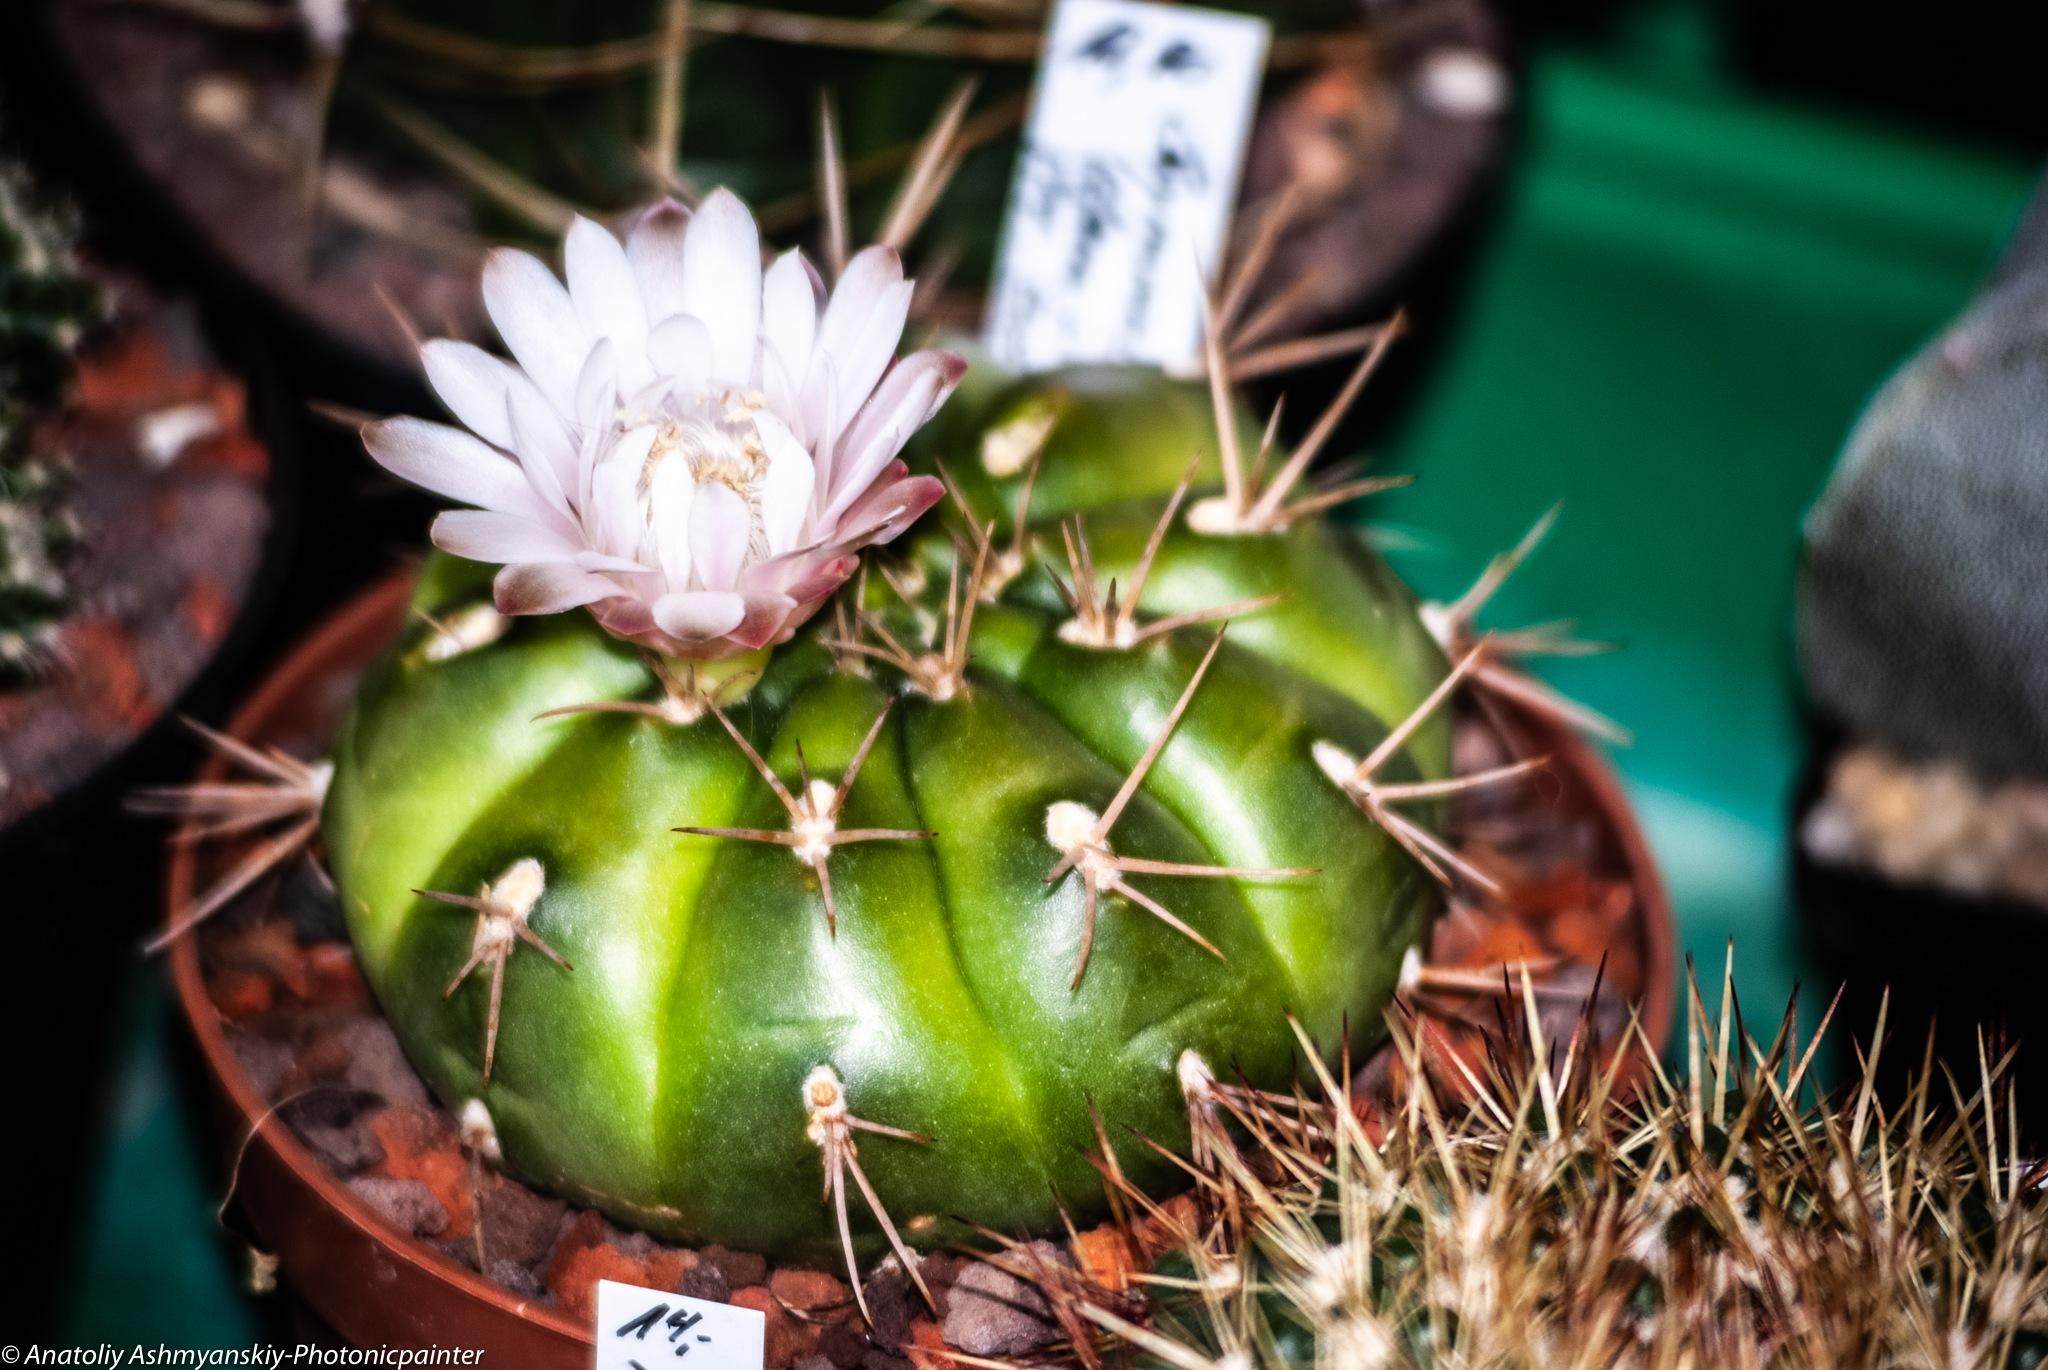 Gymnocalicium cactus by Anatoliy Ashmyanskiy